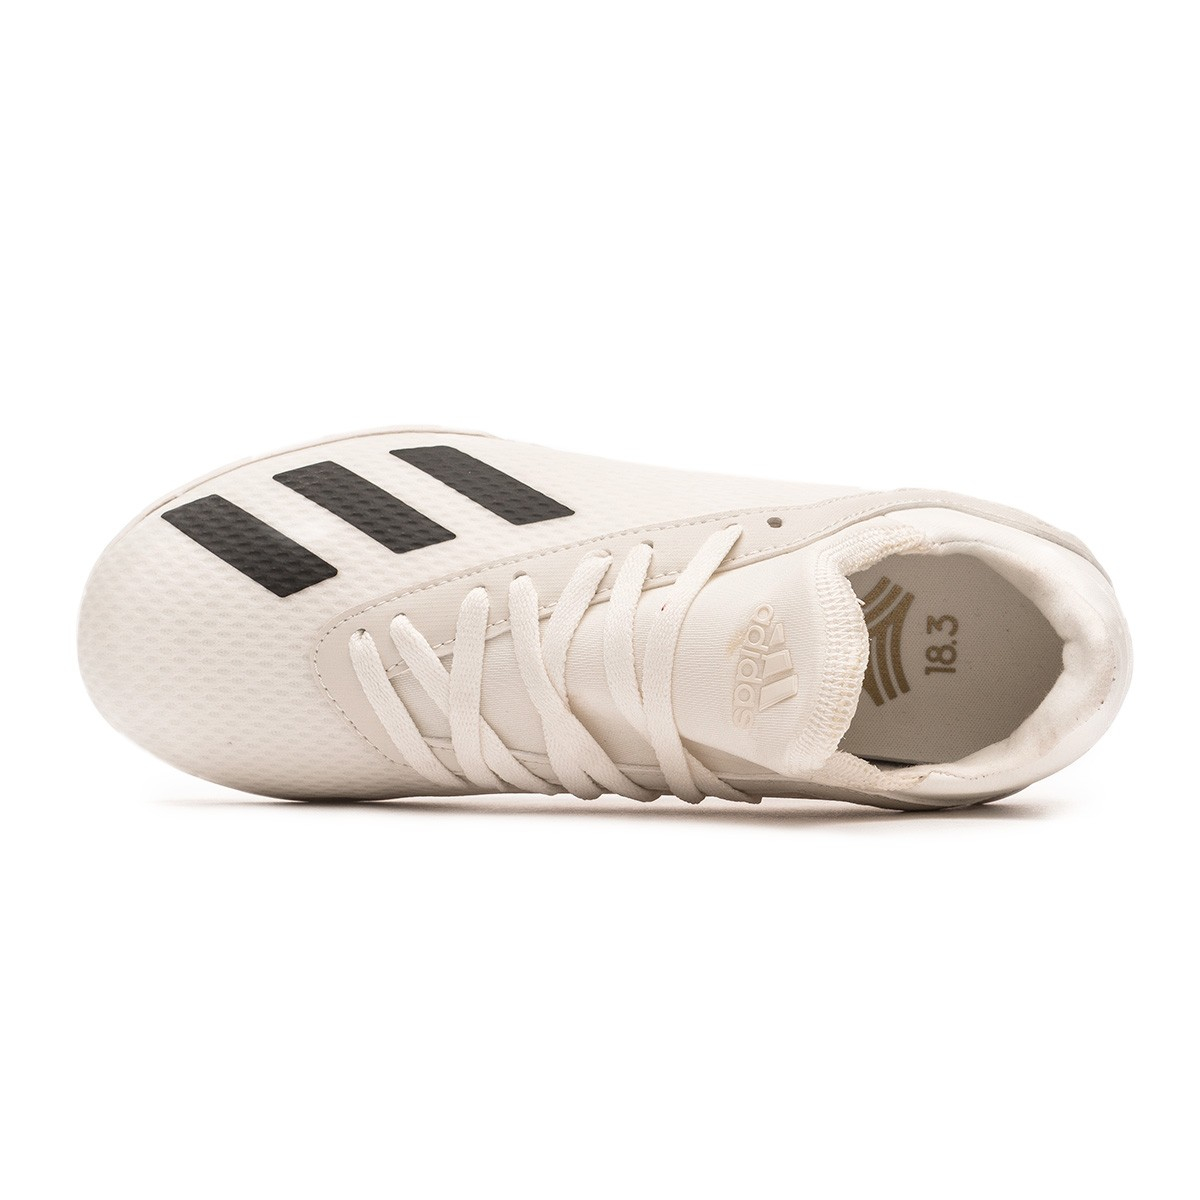 new styles ba8b1 c4a0b Chaussure de football adidas X Tango 18.3 Turf enfant Off white-White-Core  black - Boutique de football Fútbol Emotion